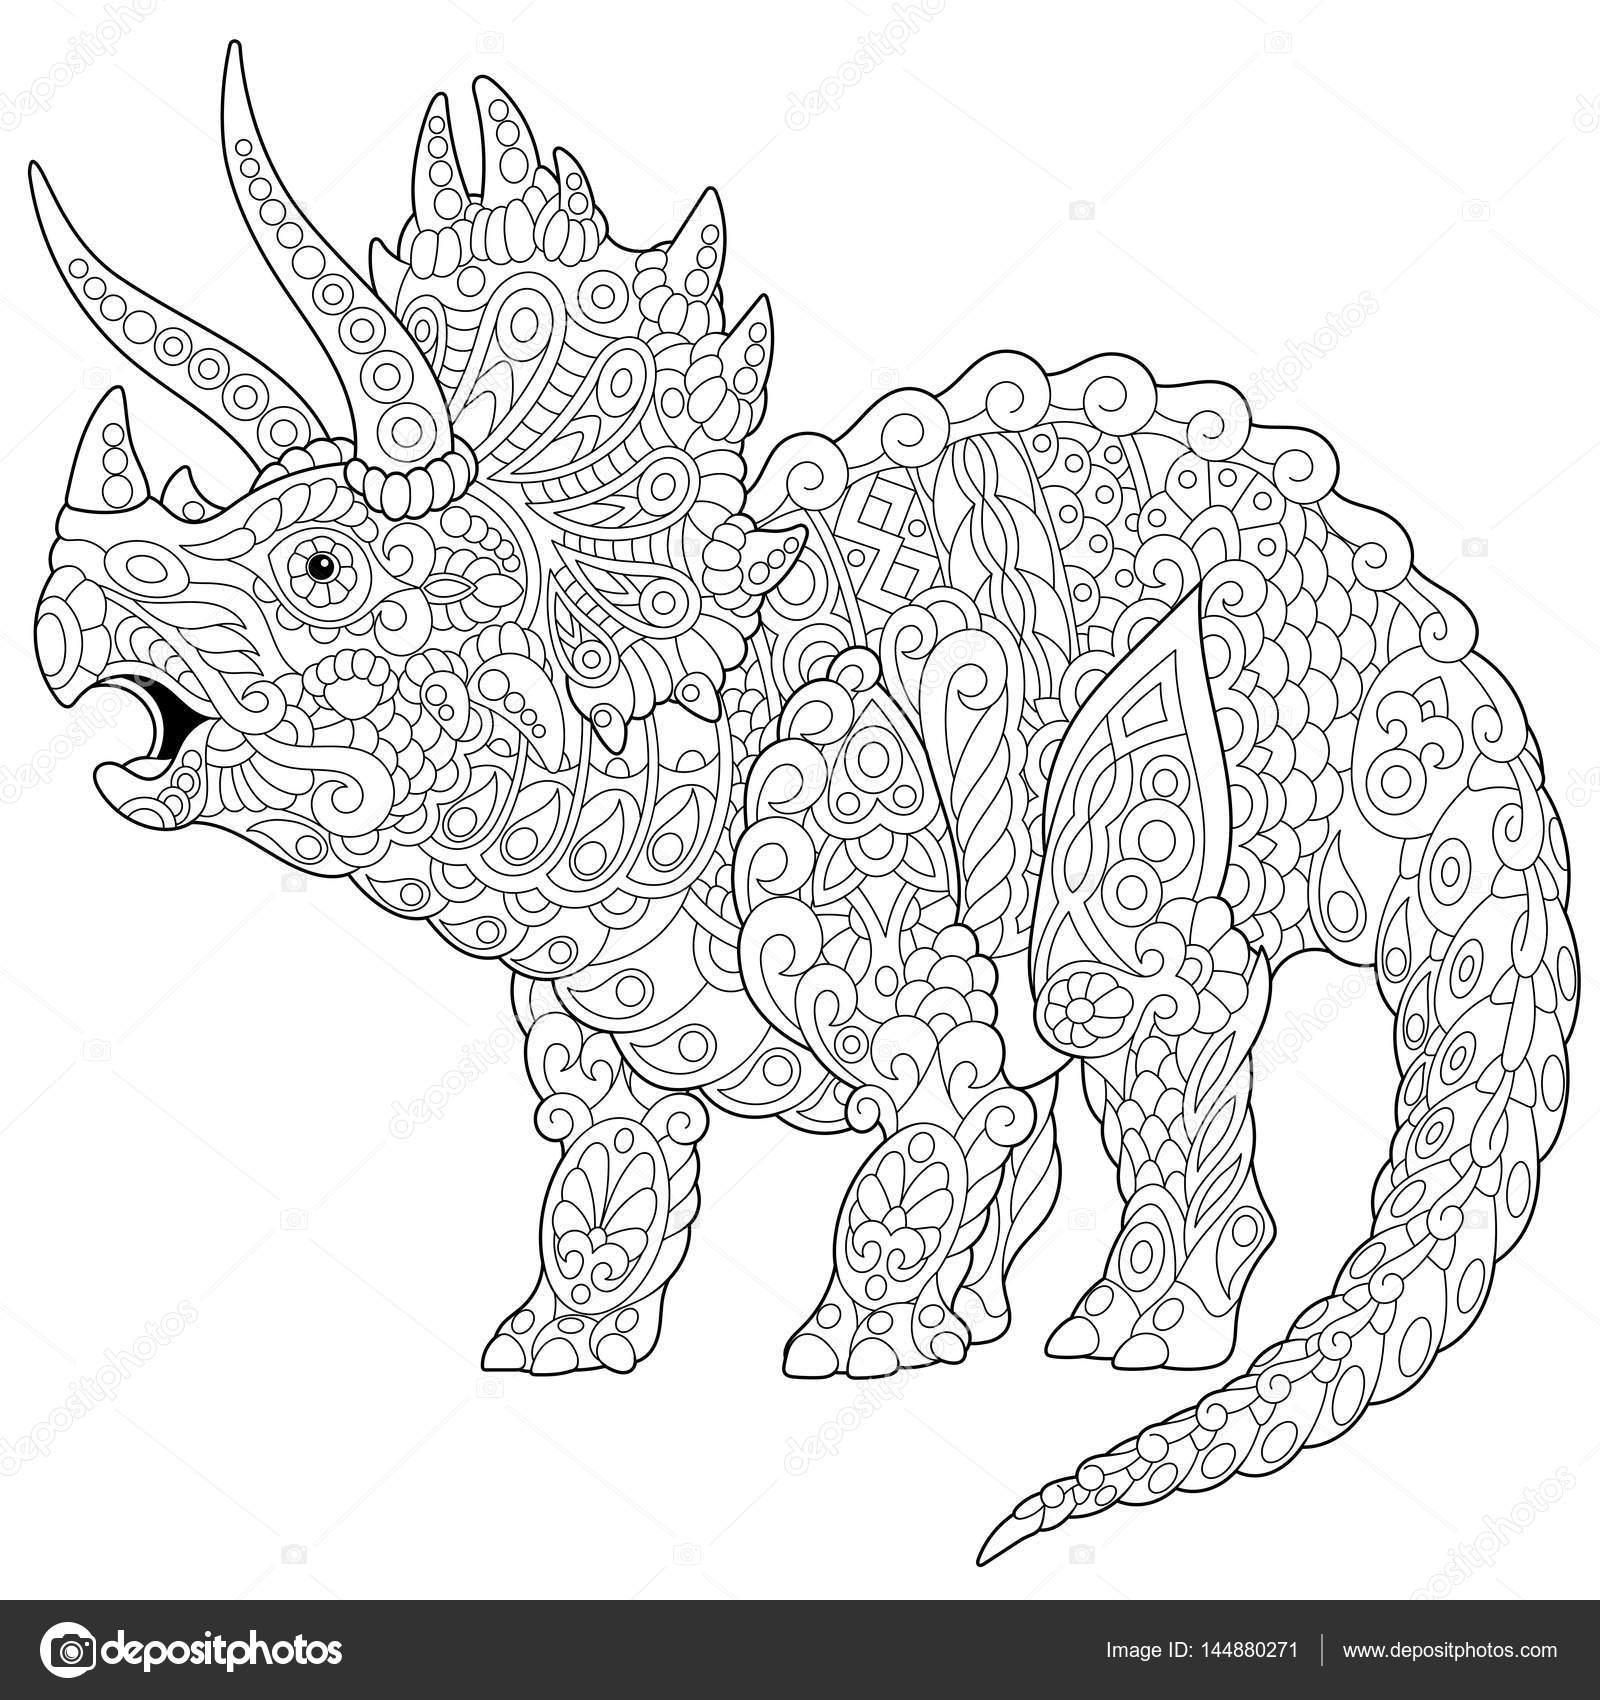 Dinozaur triceratops zentangle grafika wektorowa - Mandala dinosaure ...